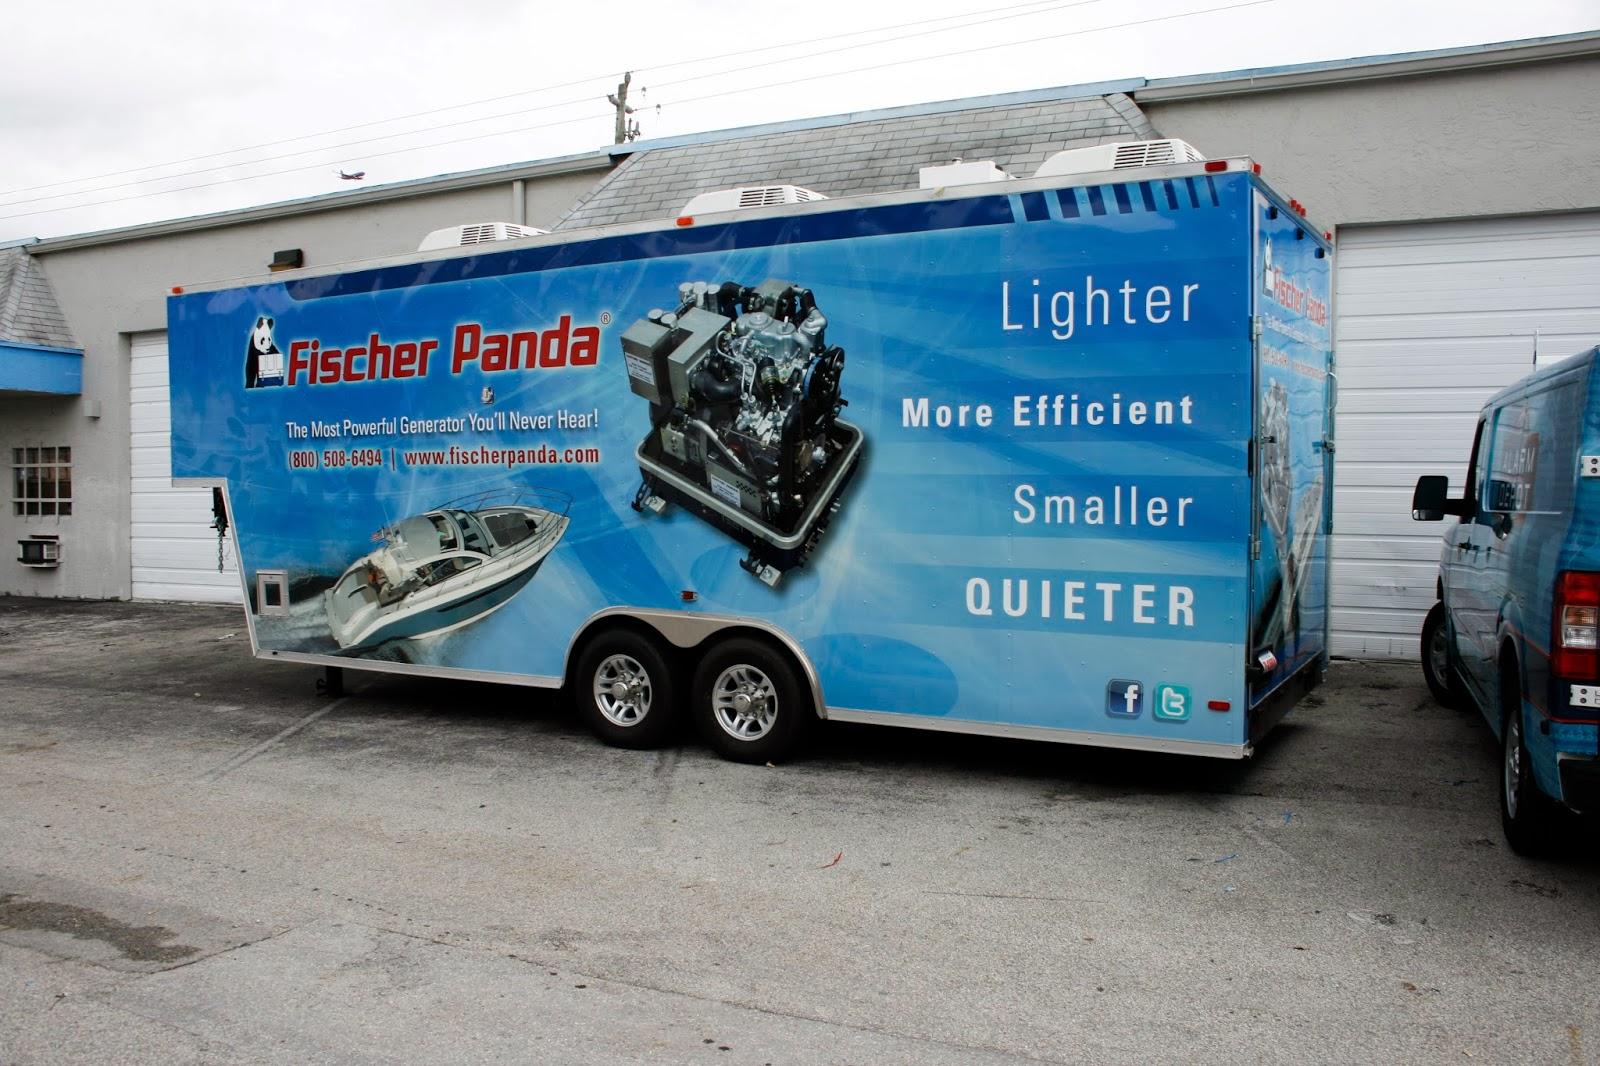 janesville cars trucks craigslist upcoming nissan madison wi craigslist trucks 2014 scion tc in janesville wi apps directories